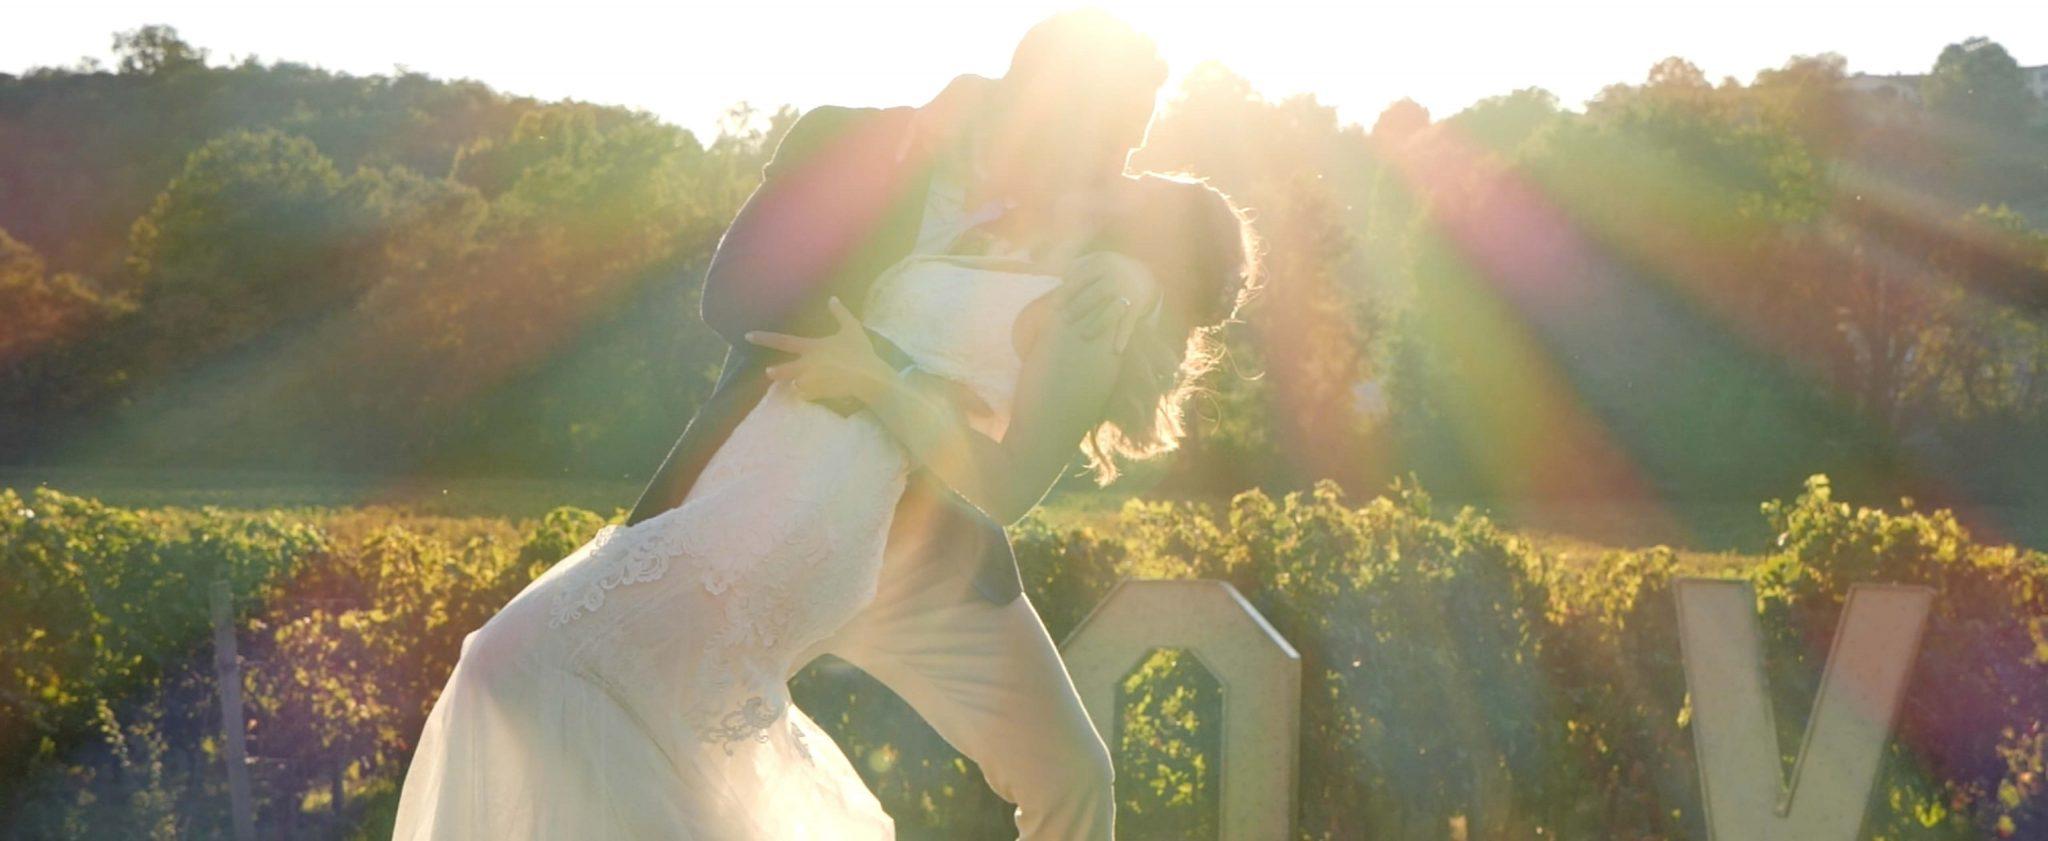 mariage-mringalss-films-pays-basque-anglet-bayonne-biarritz-pierre-frechou